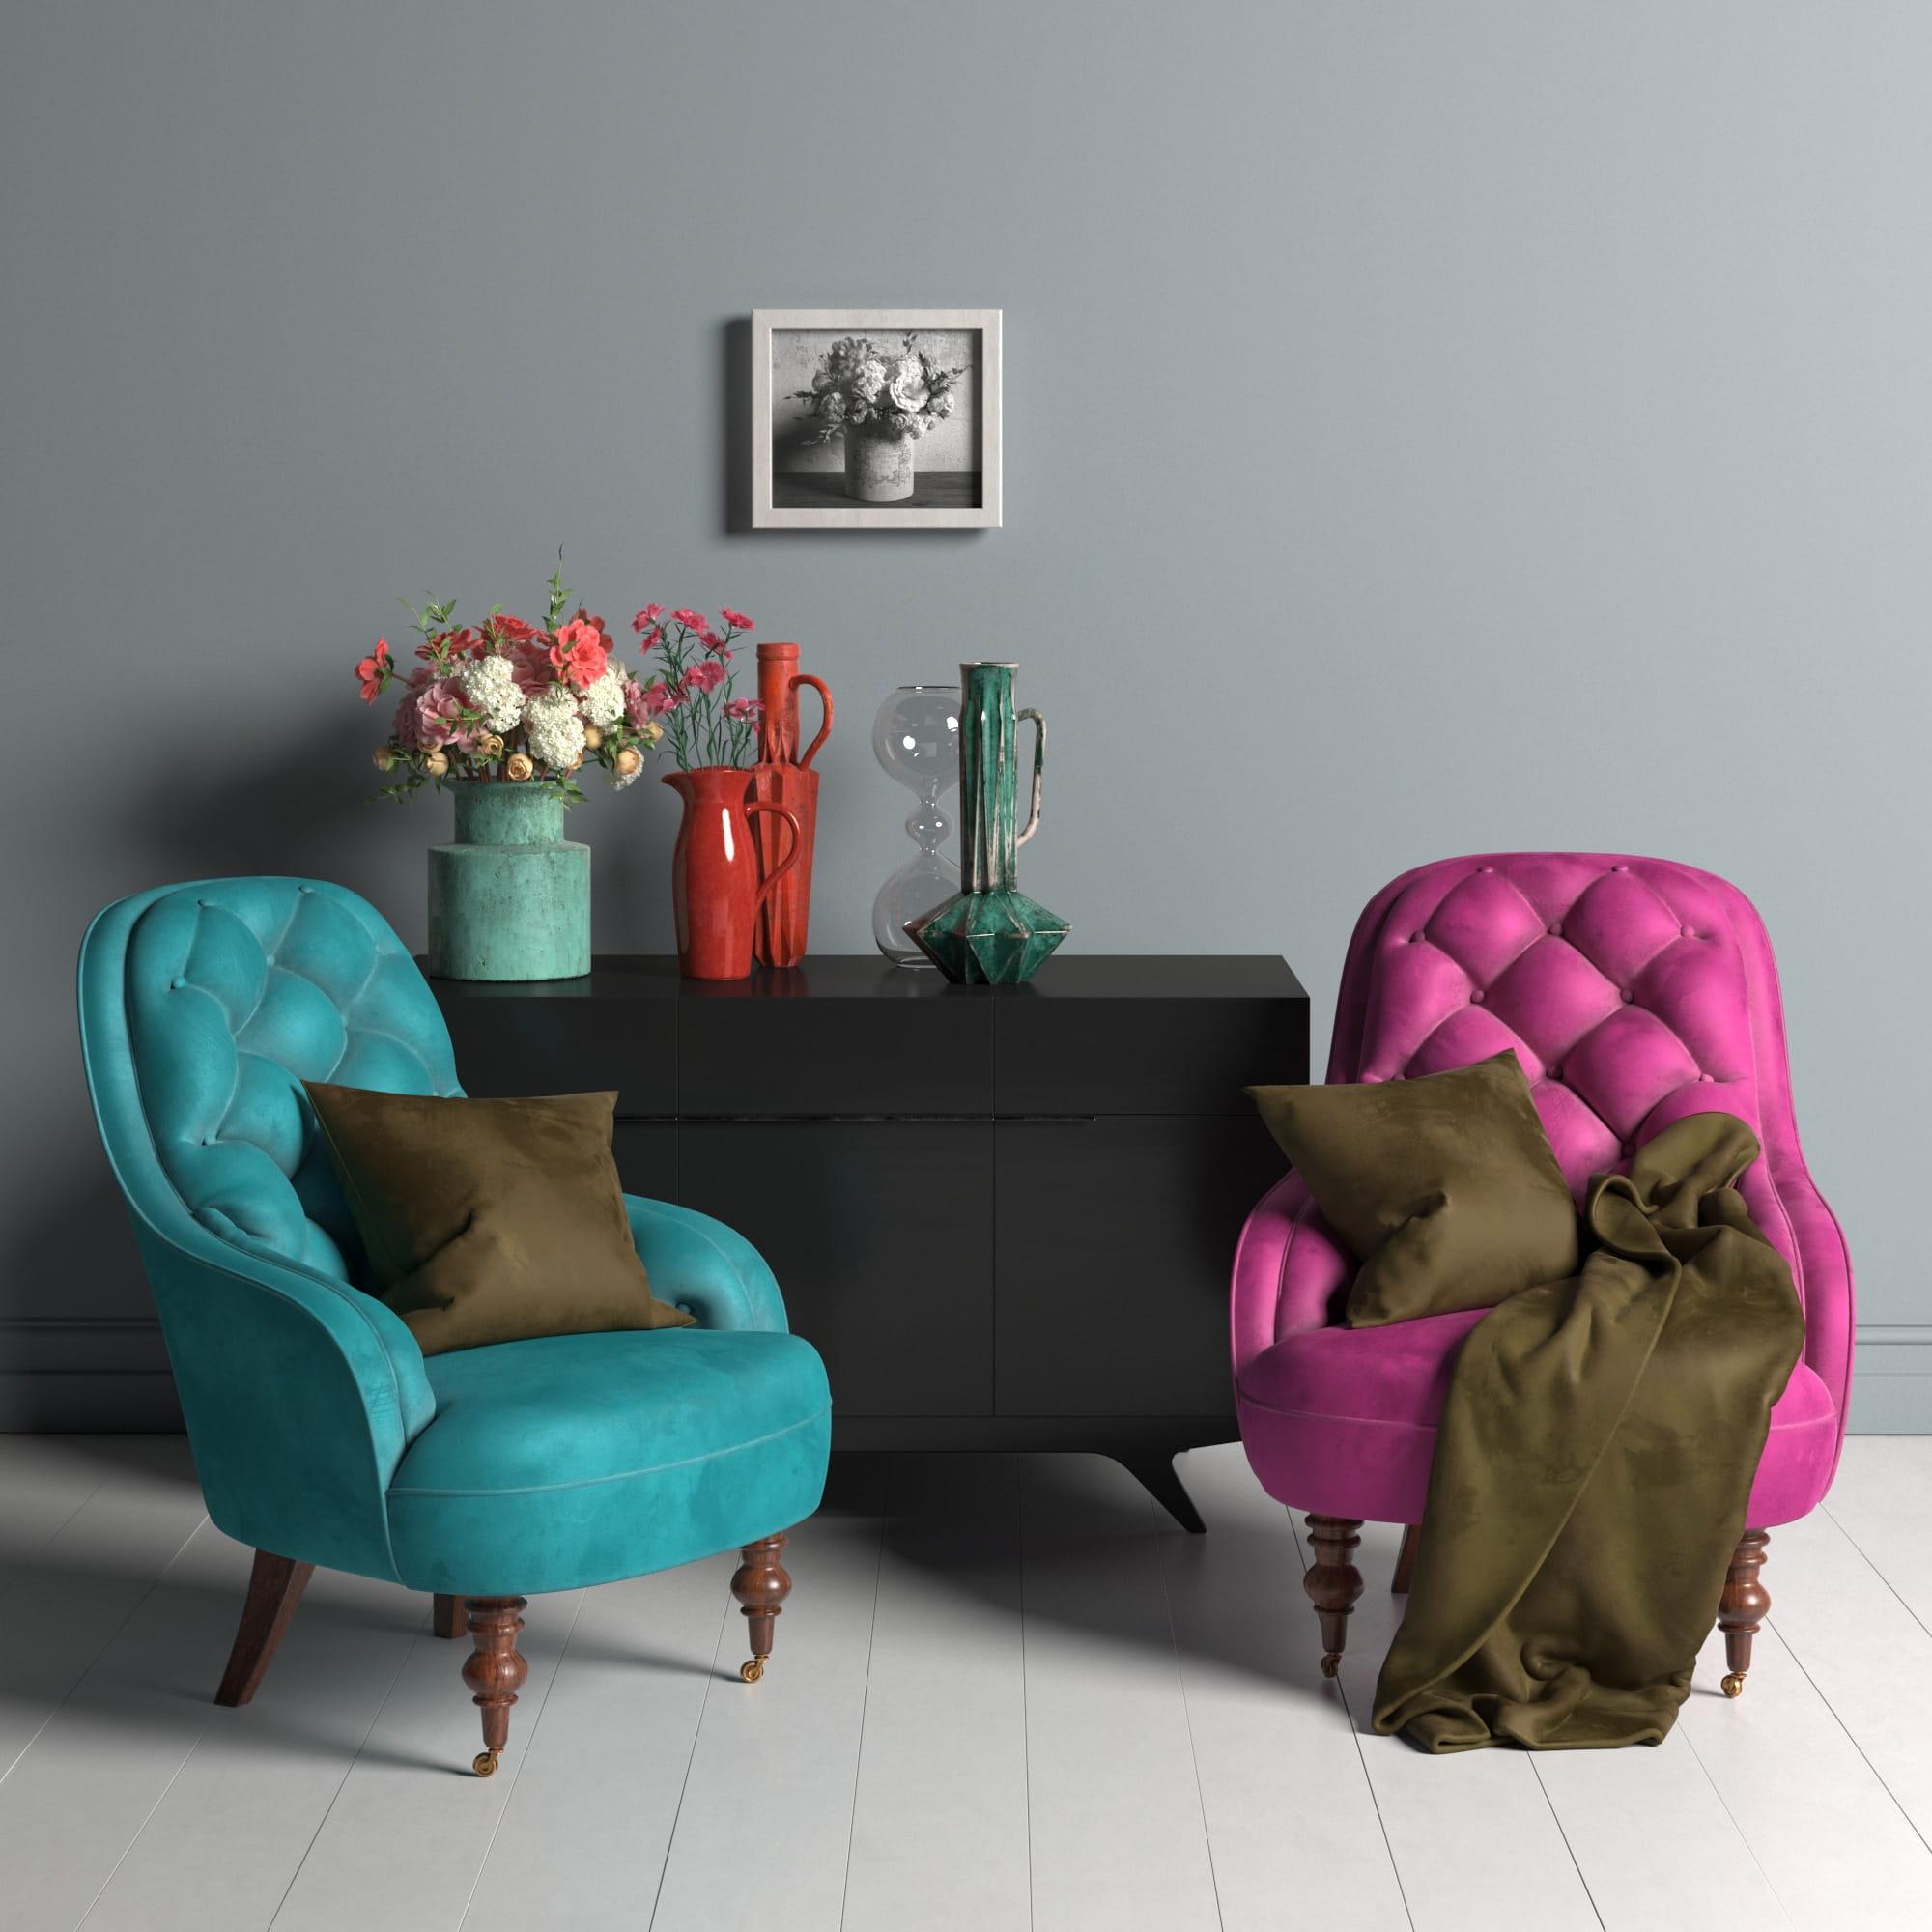 furniture set 14 AM225